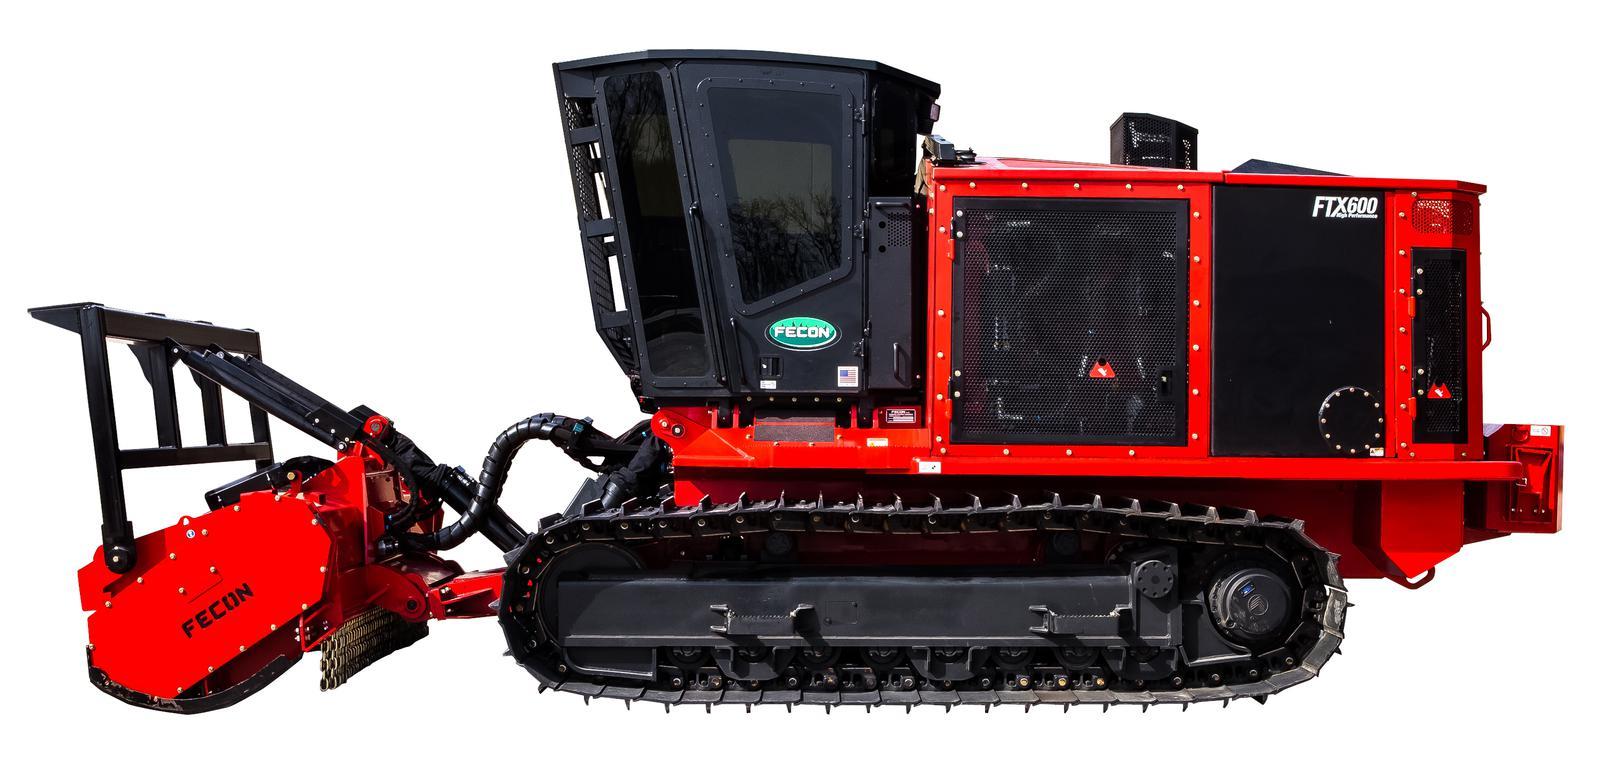 FTX600 fecon 2019 ftx600 for sale in burnsville, mn tri state bobcat